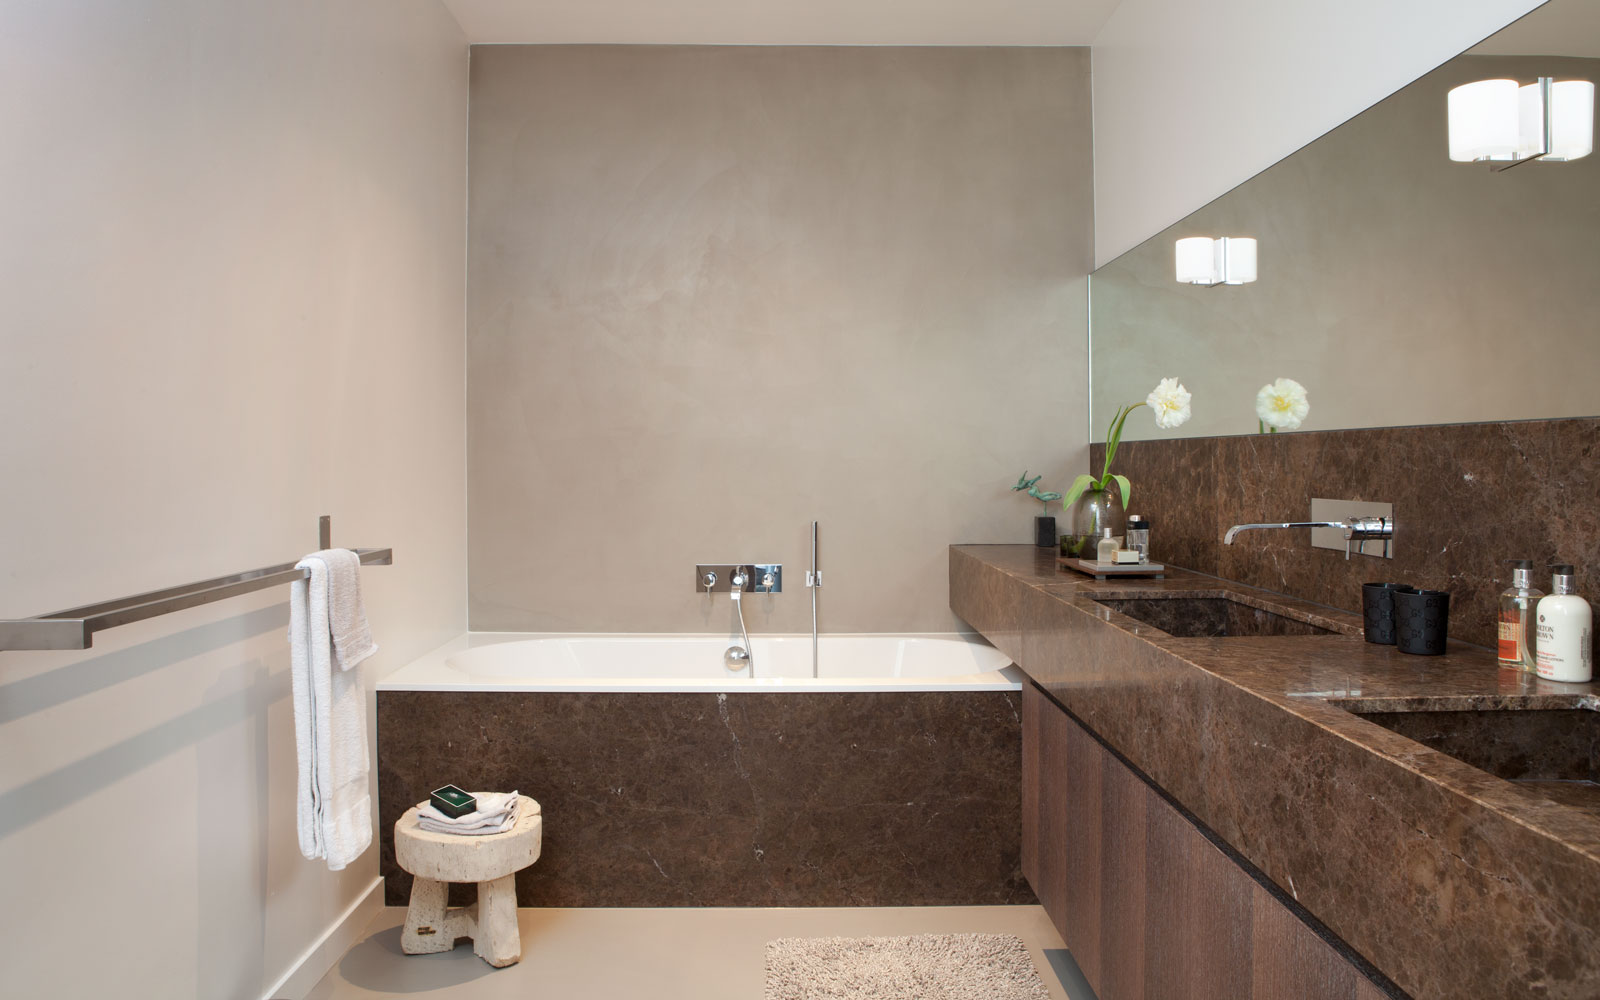 Luxe Badkamer, marmer, bad, Villeroy & Boch, wastafel, contrast, wengé, natuursteen, Penthouse Amsterdam, Remy Meijers